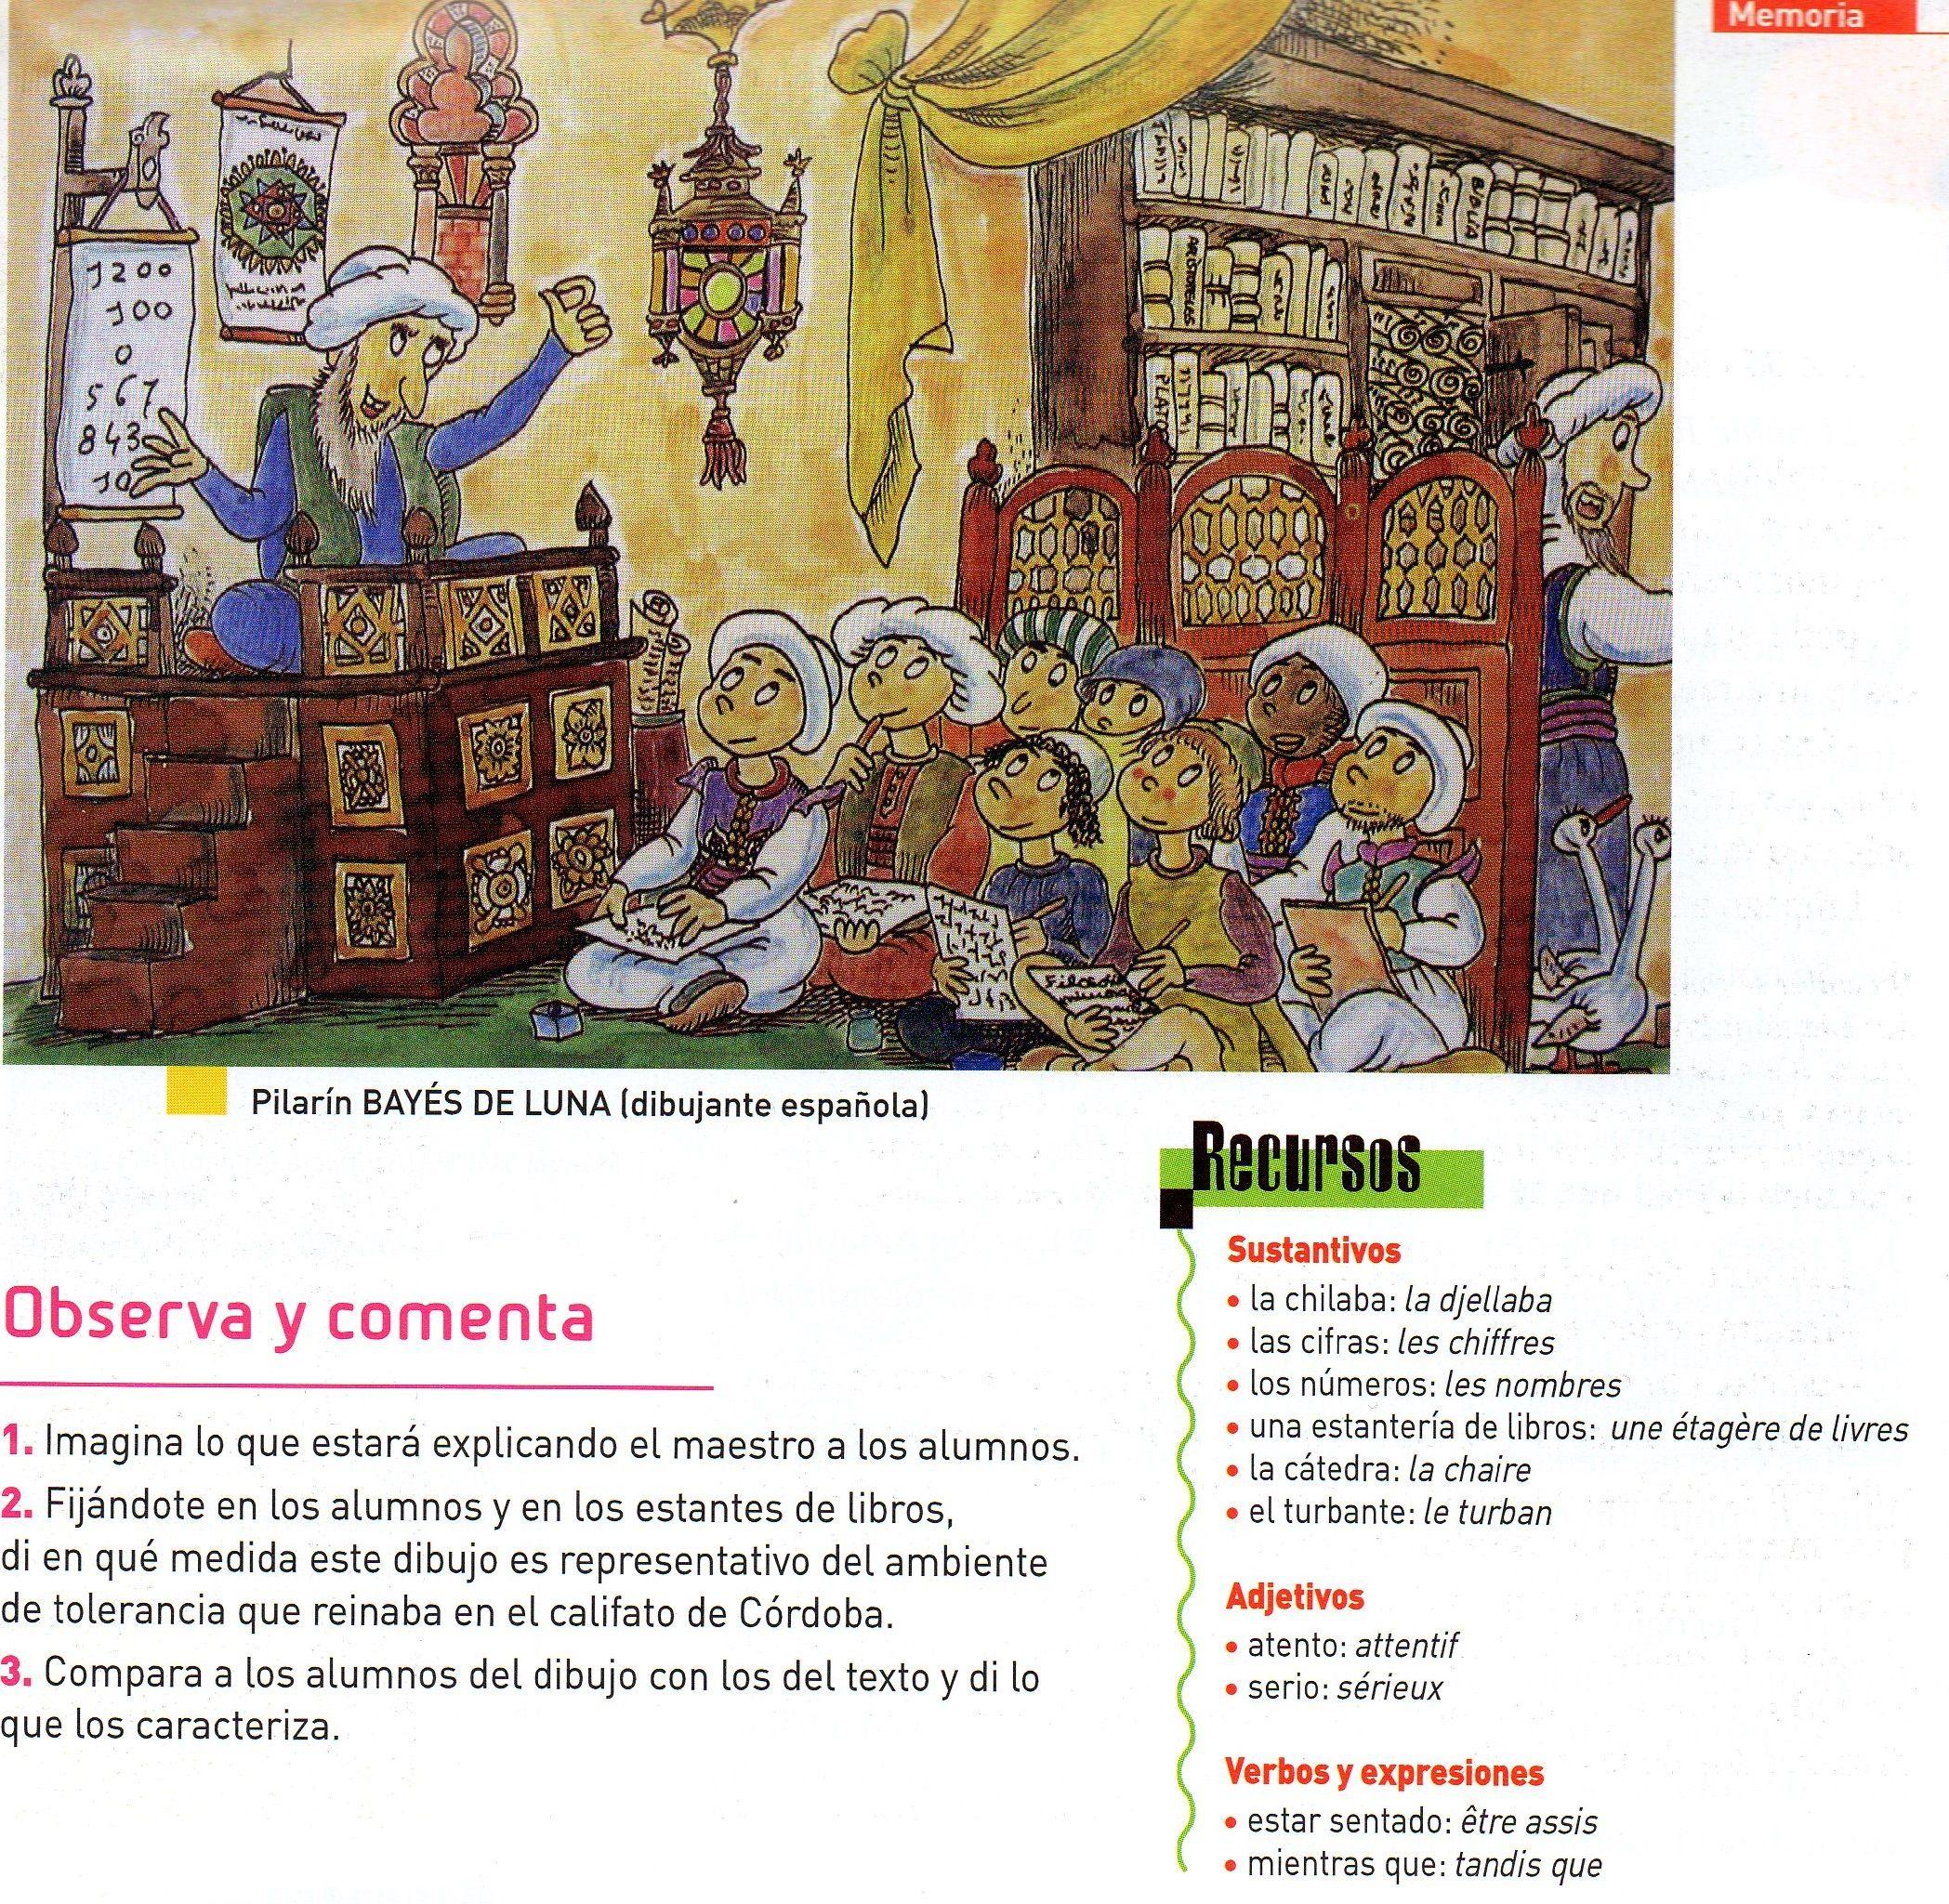 5175a11213d558166b1e8ed58f80da02 pin by leen decaluwé on al andalús pinterest historia and spanish